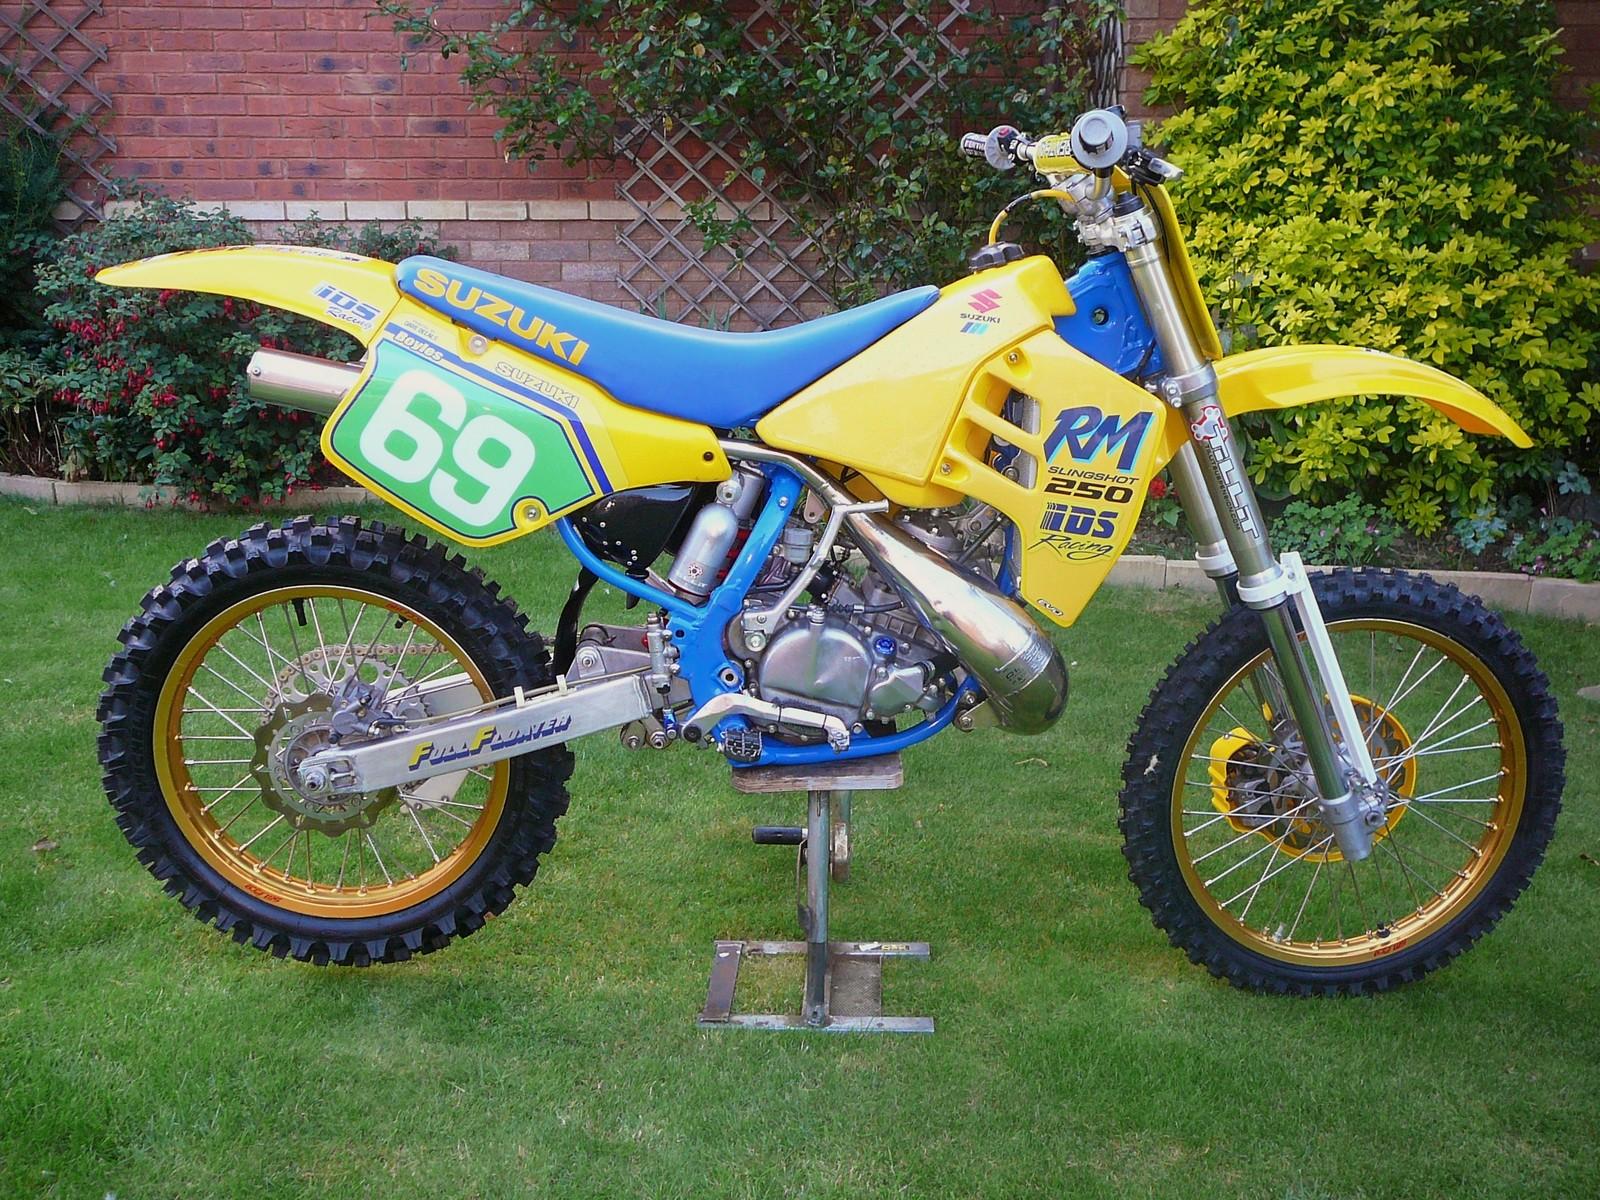 Ebc Brake Pads >> Suzuki RM250 1989 - RussB's Bike Check - Vital MX